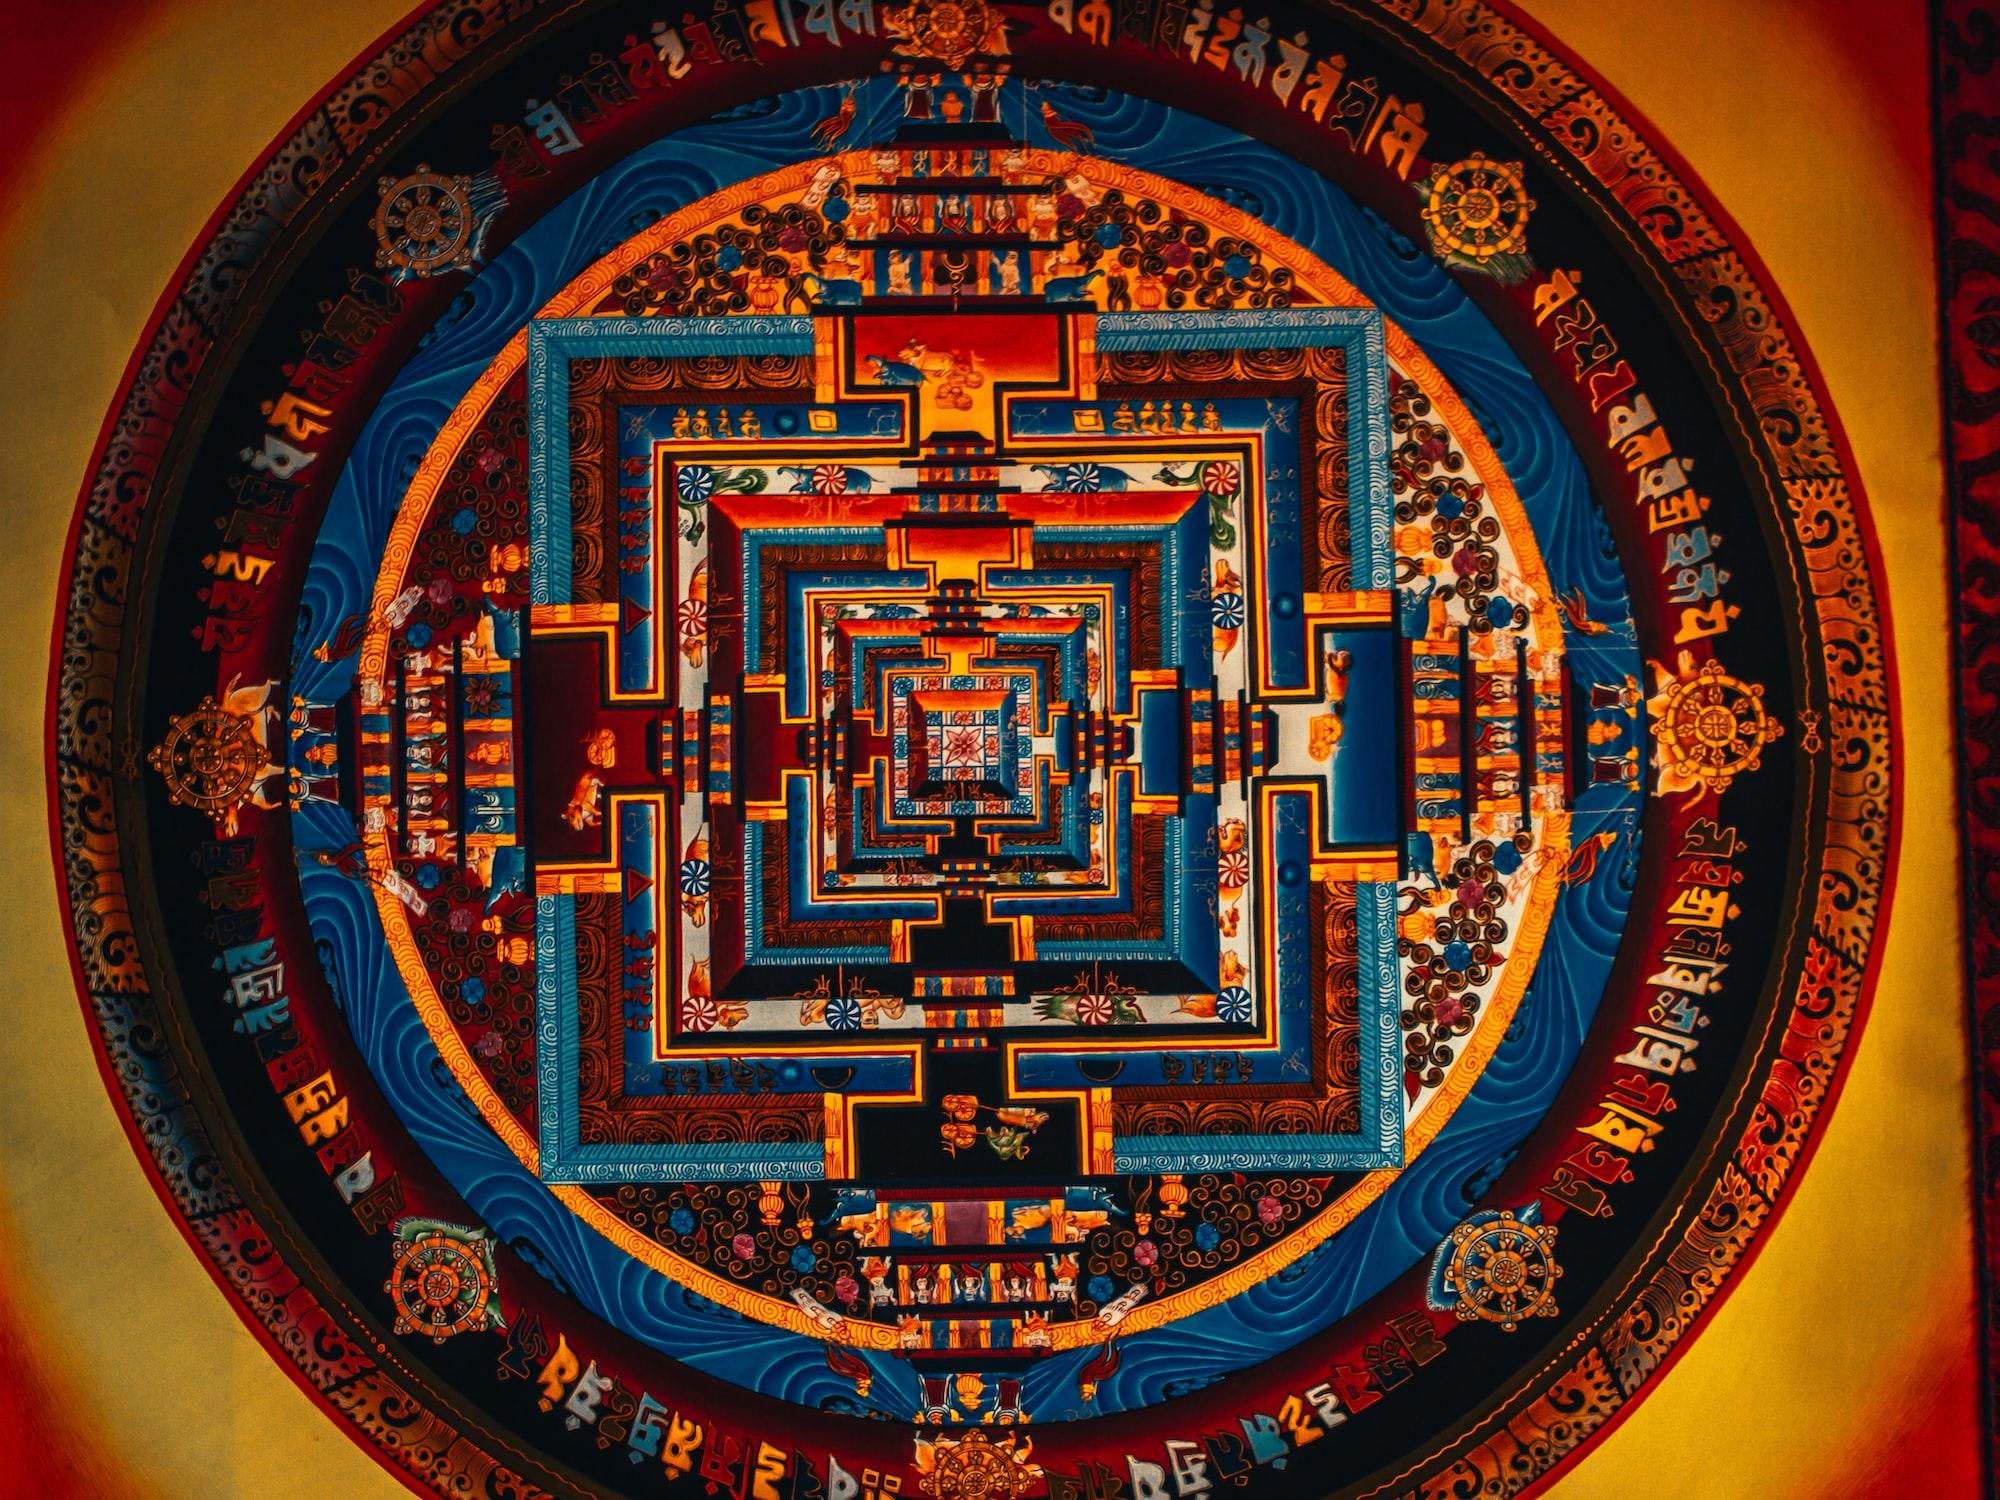 Colored Thanka Yantra buddhist arts in Kathmandu Nepal